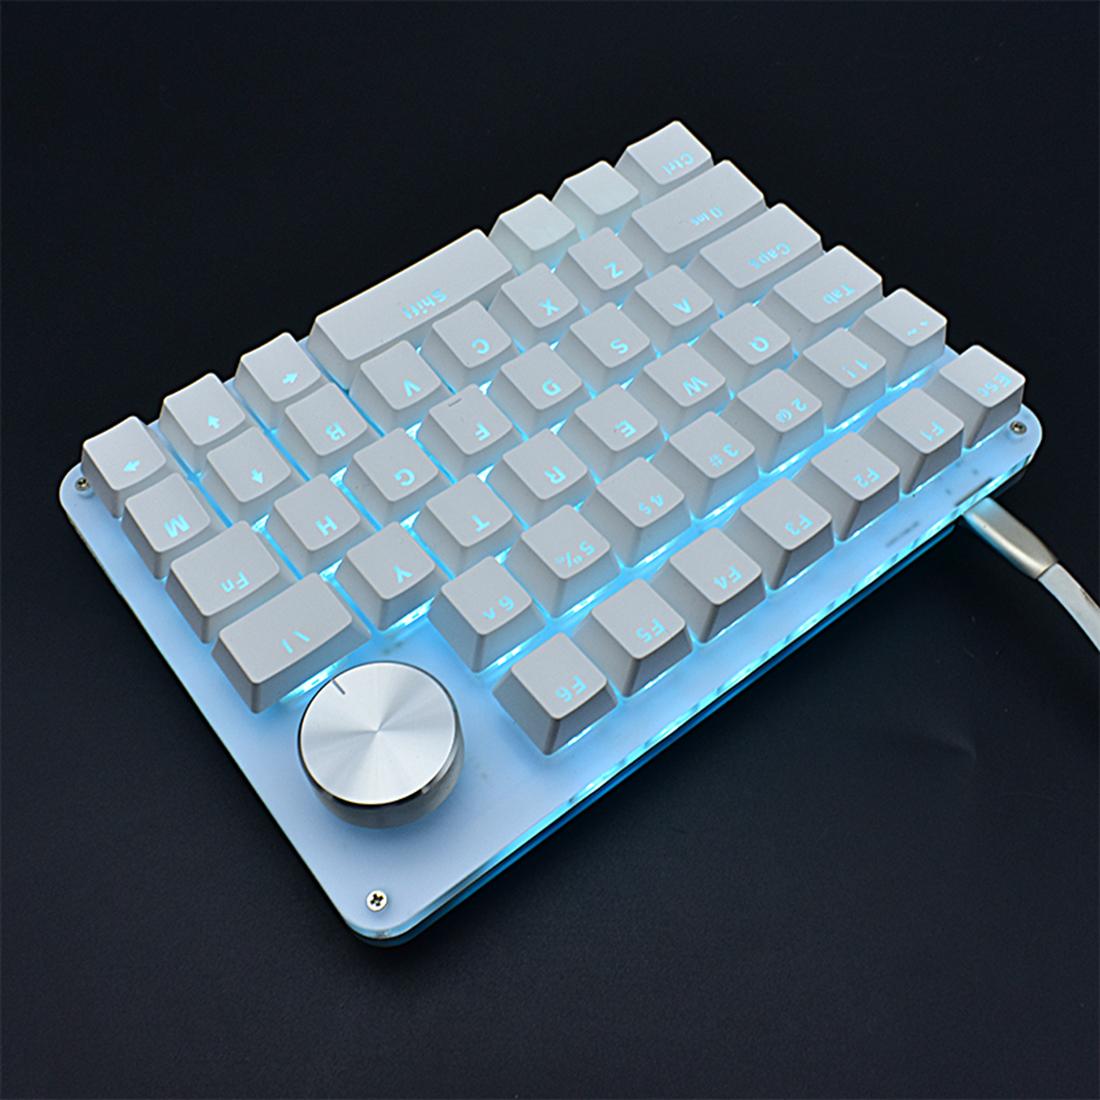 G50 Portable One-Handed Knob Keyboard Macro Fully Programmable Mechanical Keyboard